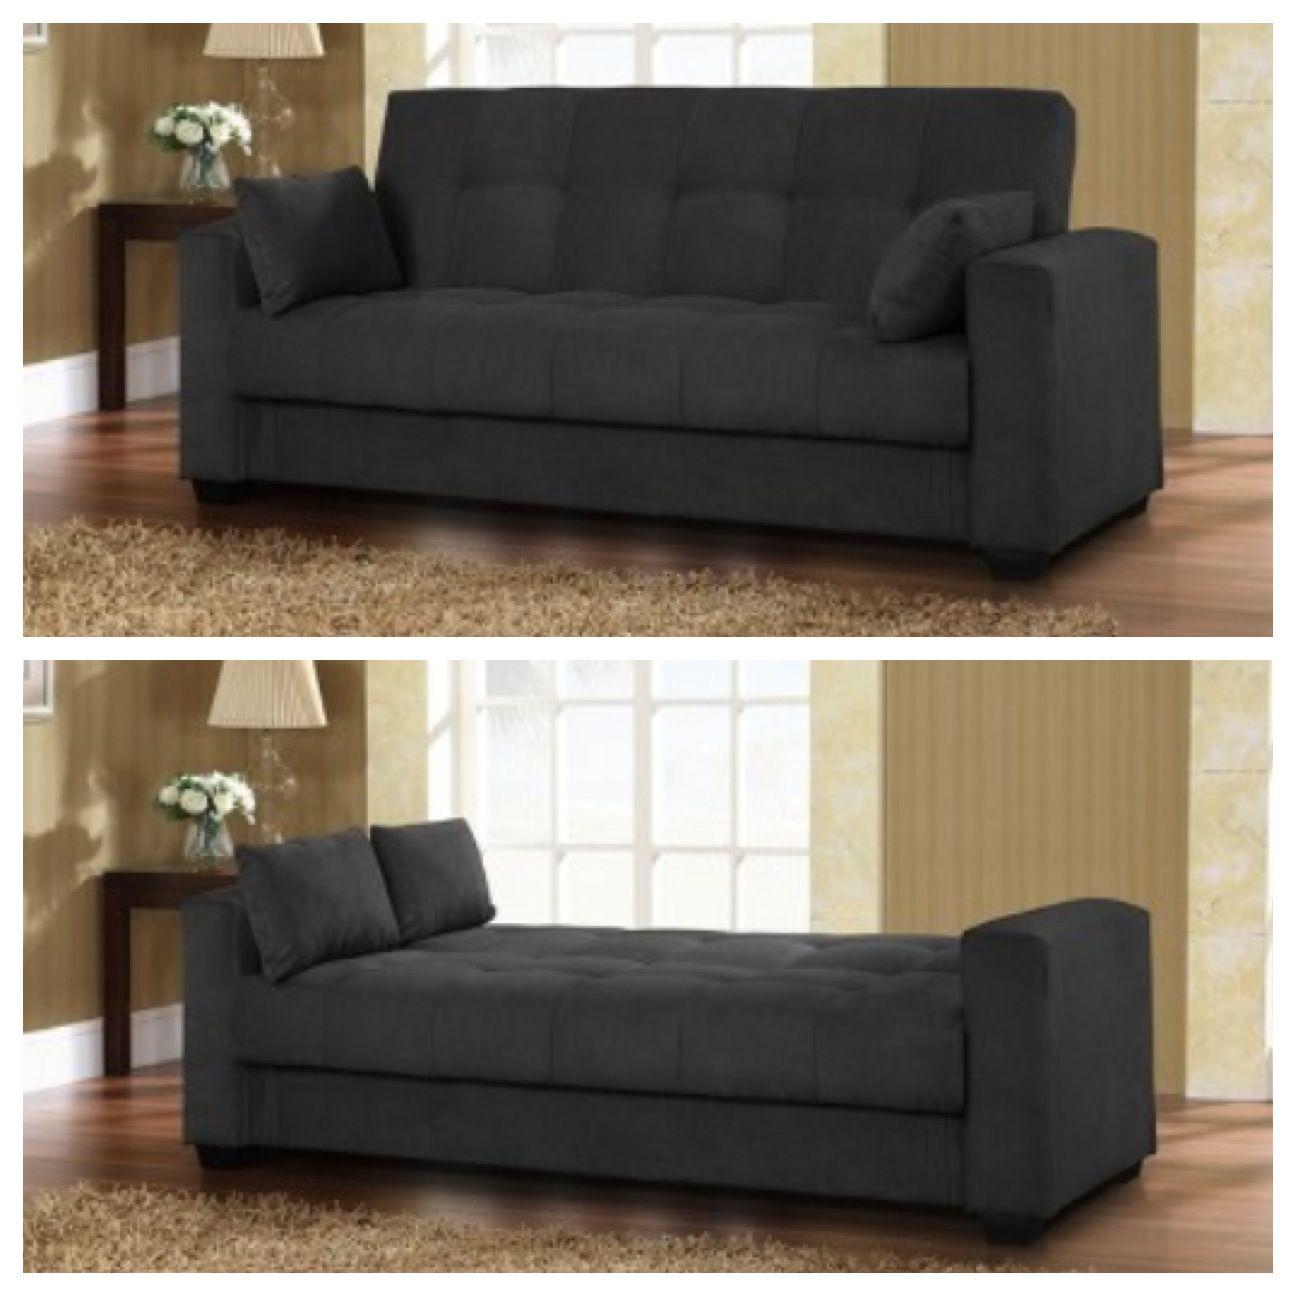 Sleeper Sofa From Target Com Futon Bedroom Small Spaces Futon